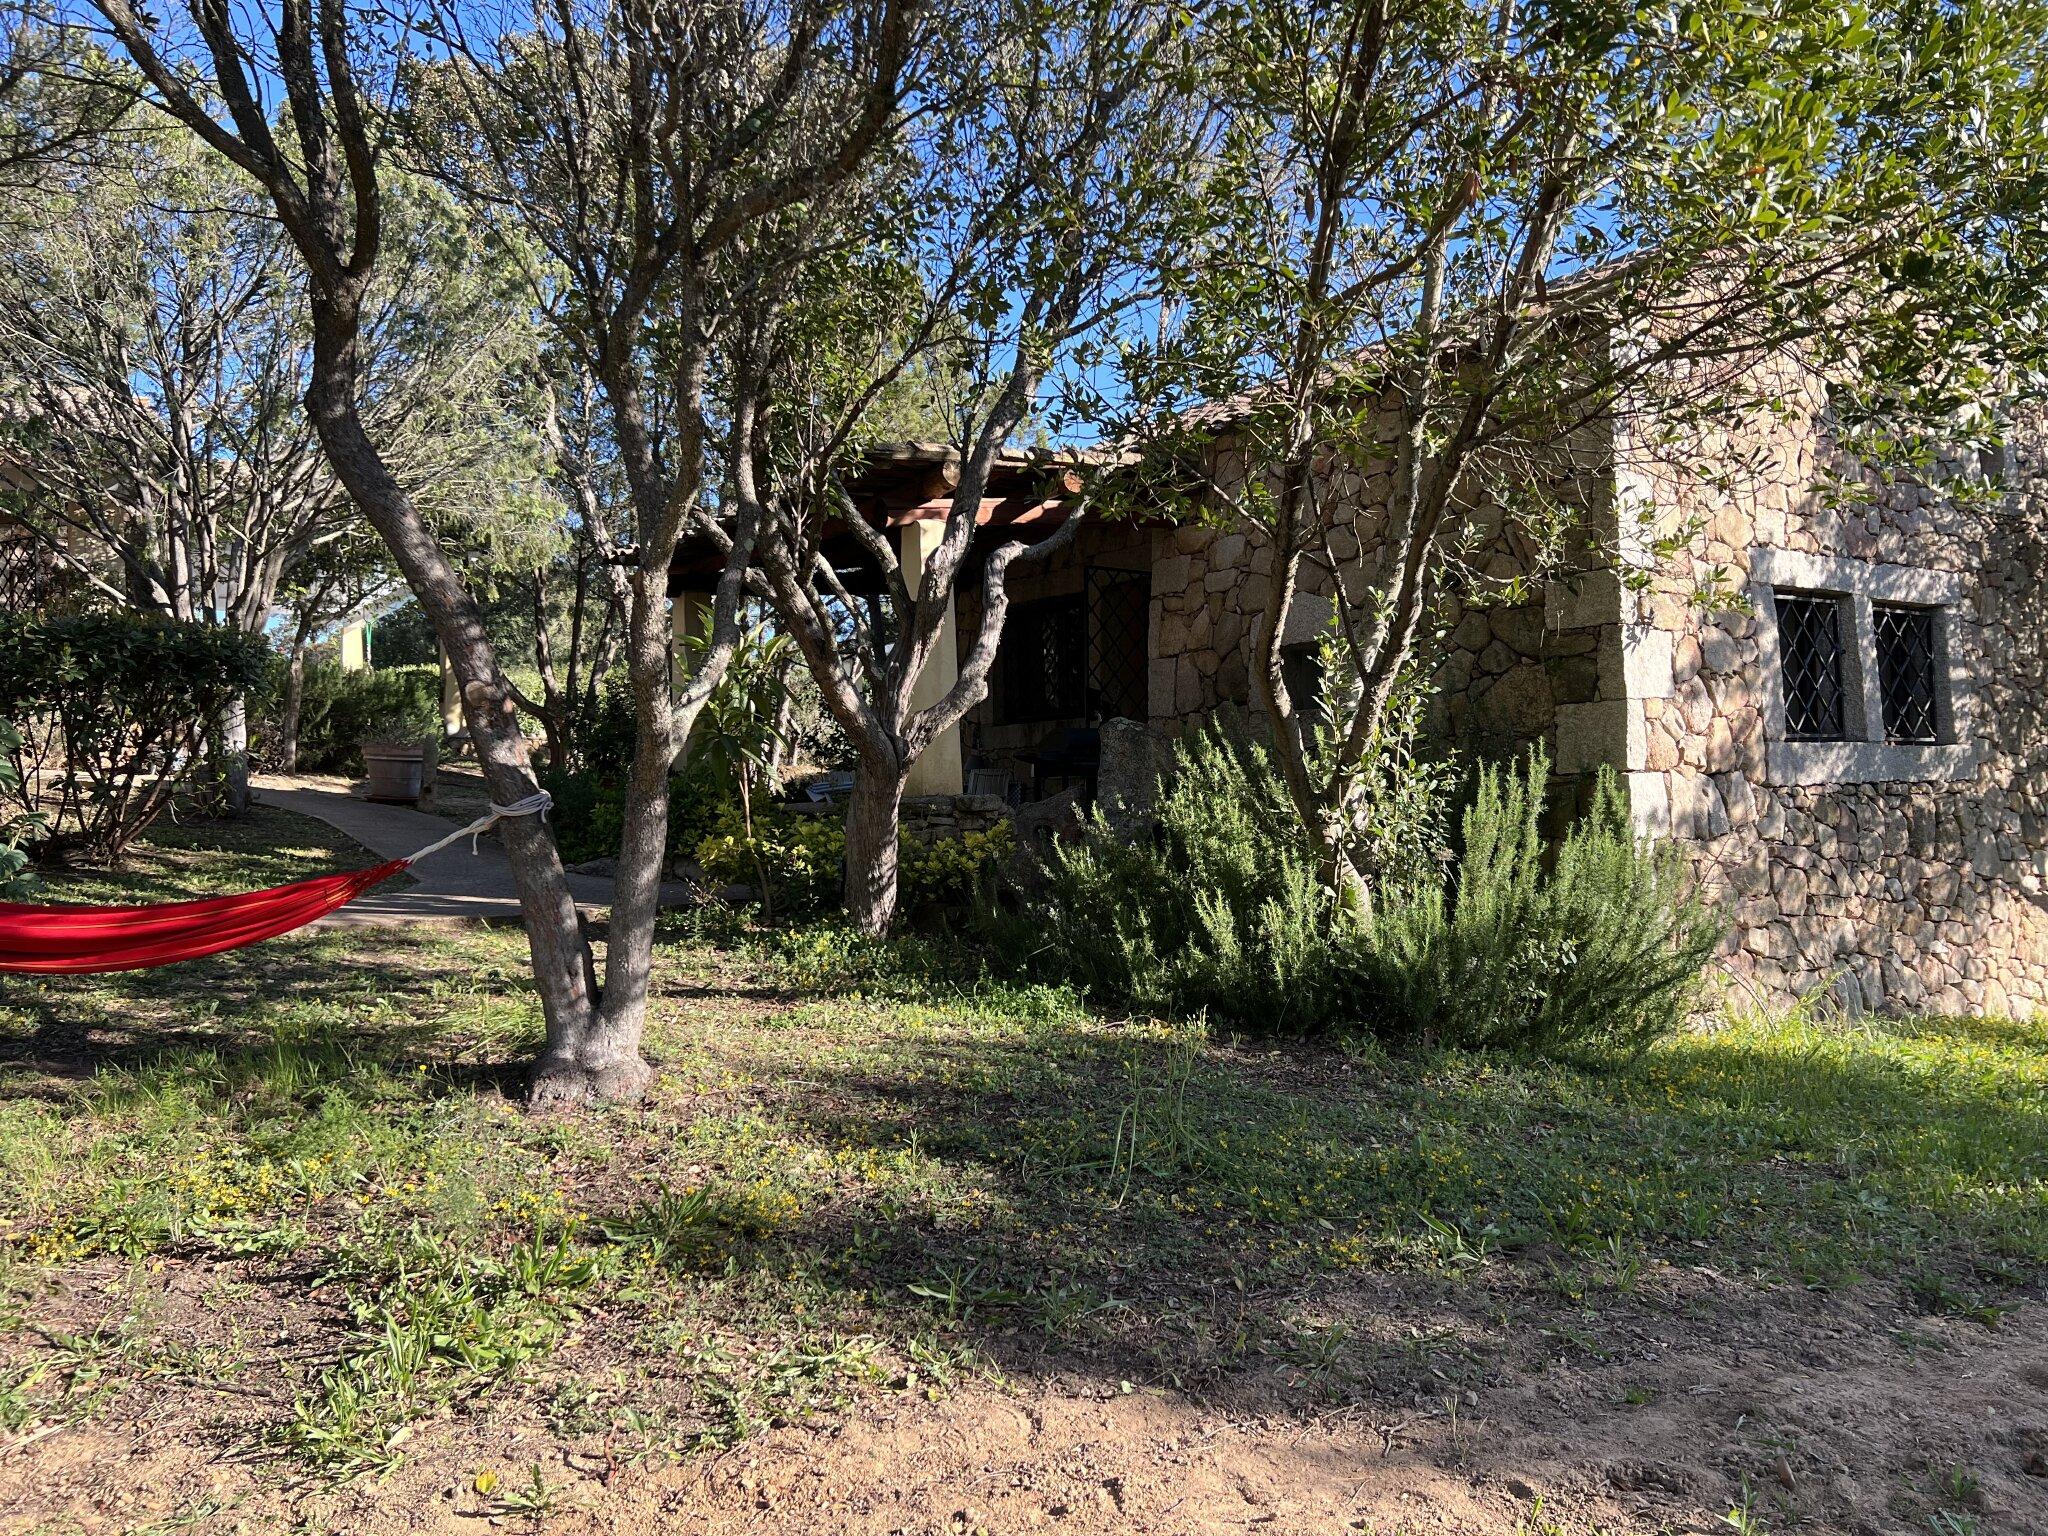 Casa Azzurra und Casa Rosmarino vom Heli